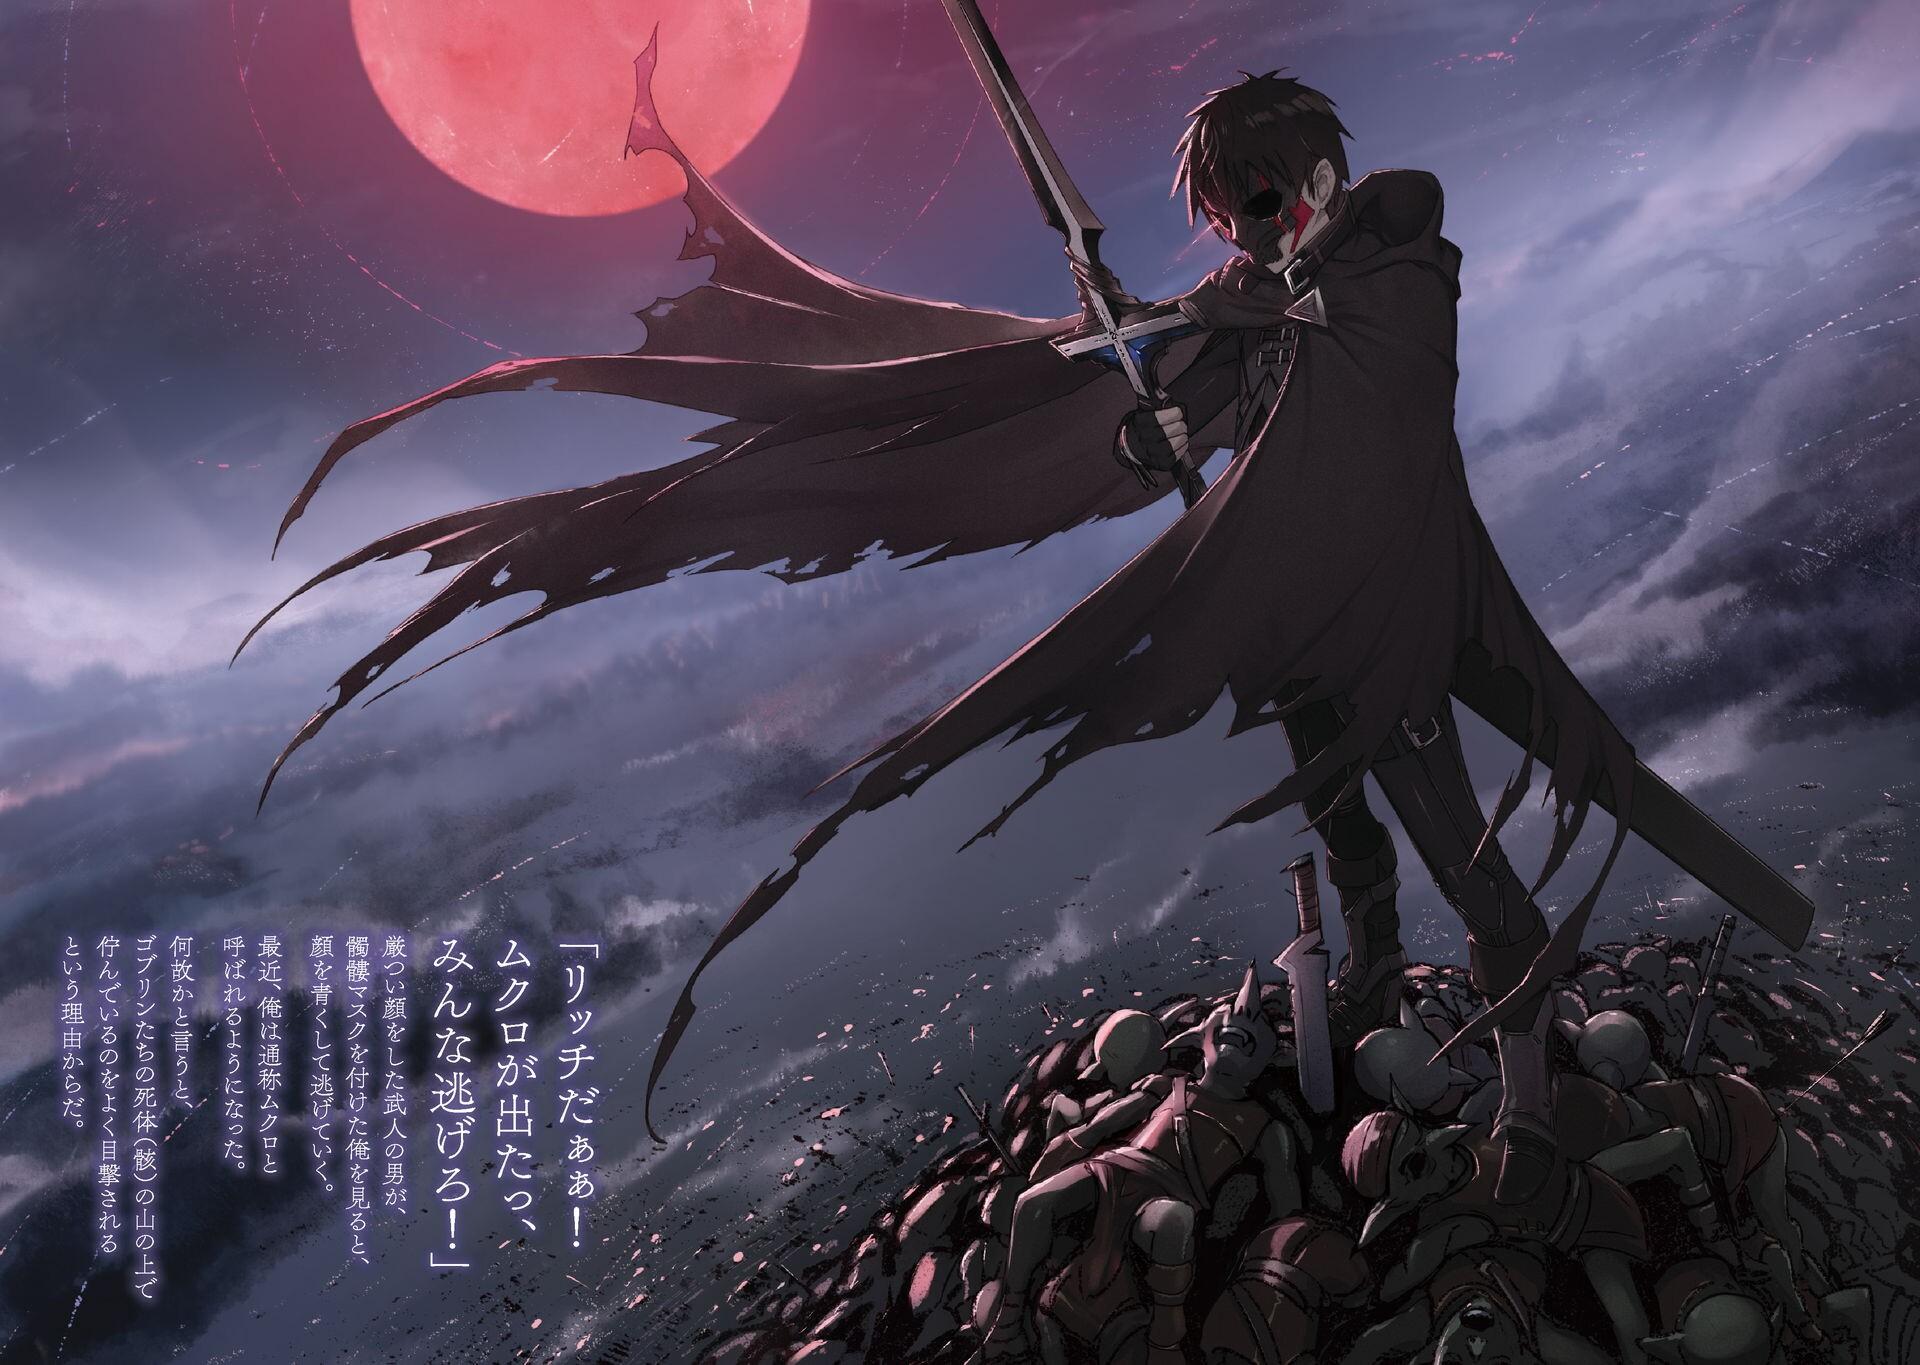 23 4k Anime Wallpaper Berserk Tachi Wallpaper 23 anime wallpaper berserk